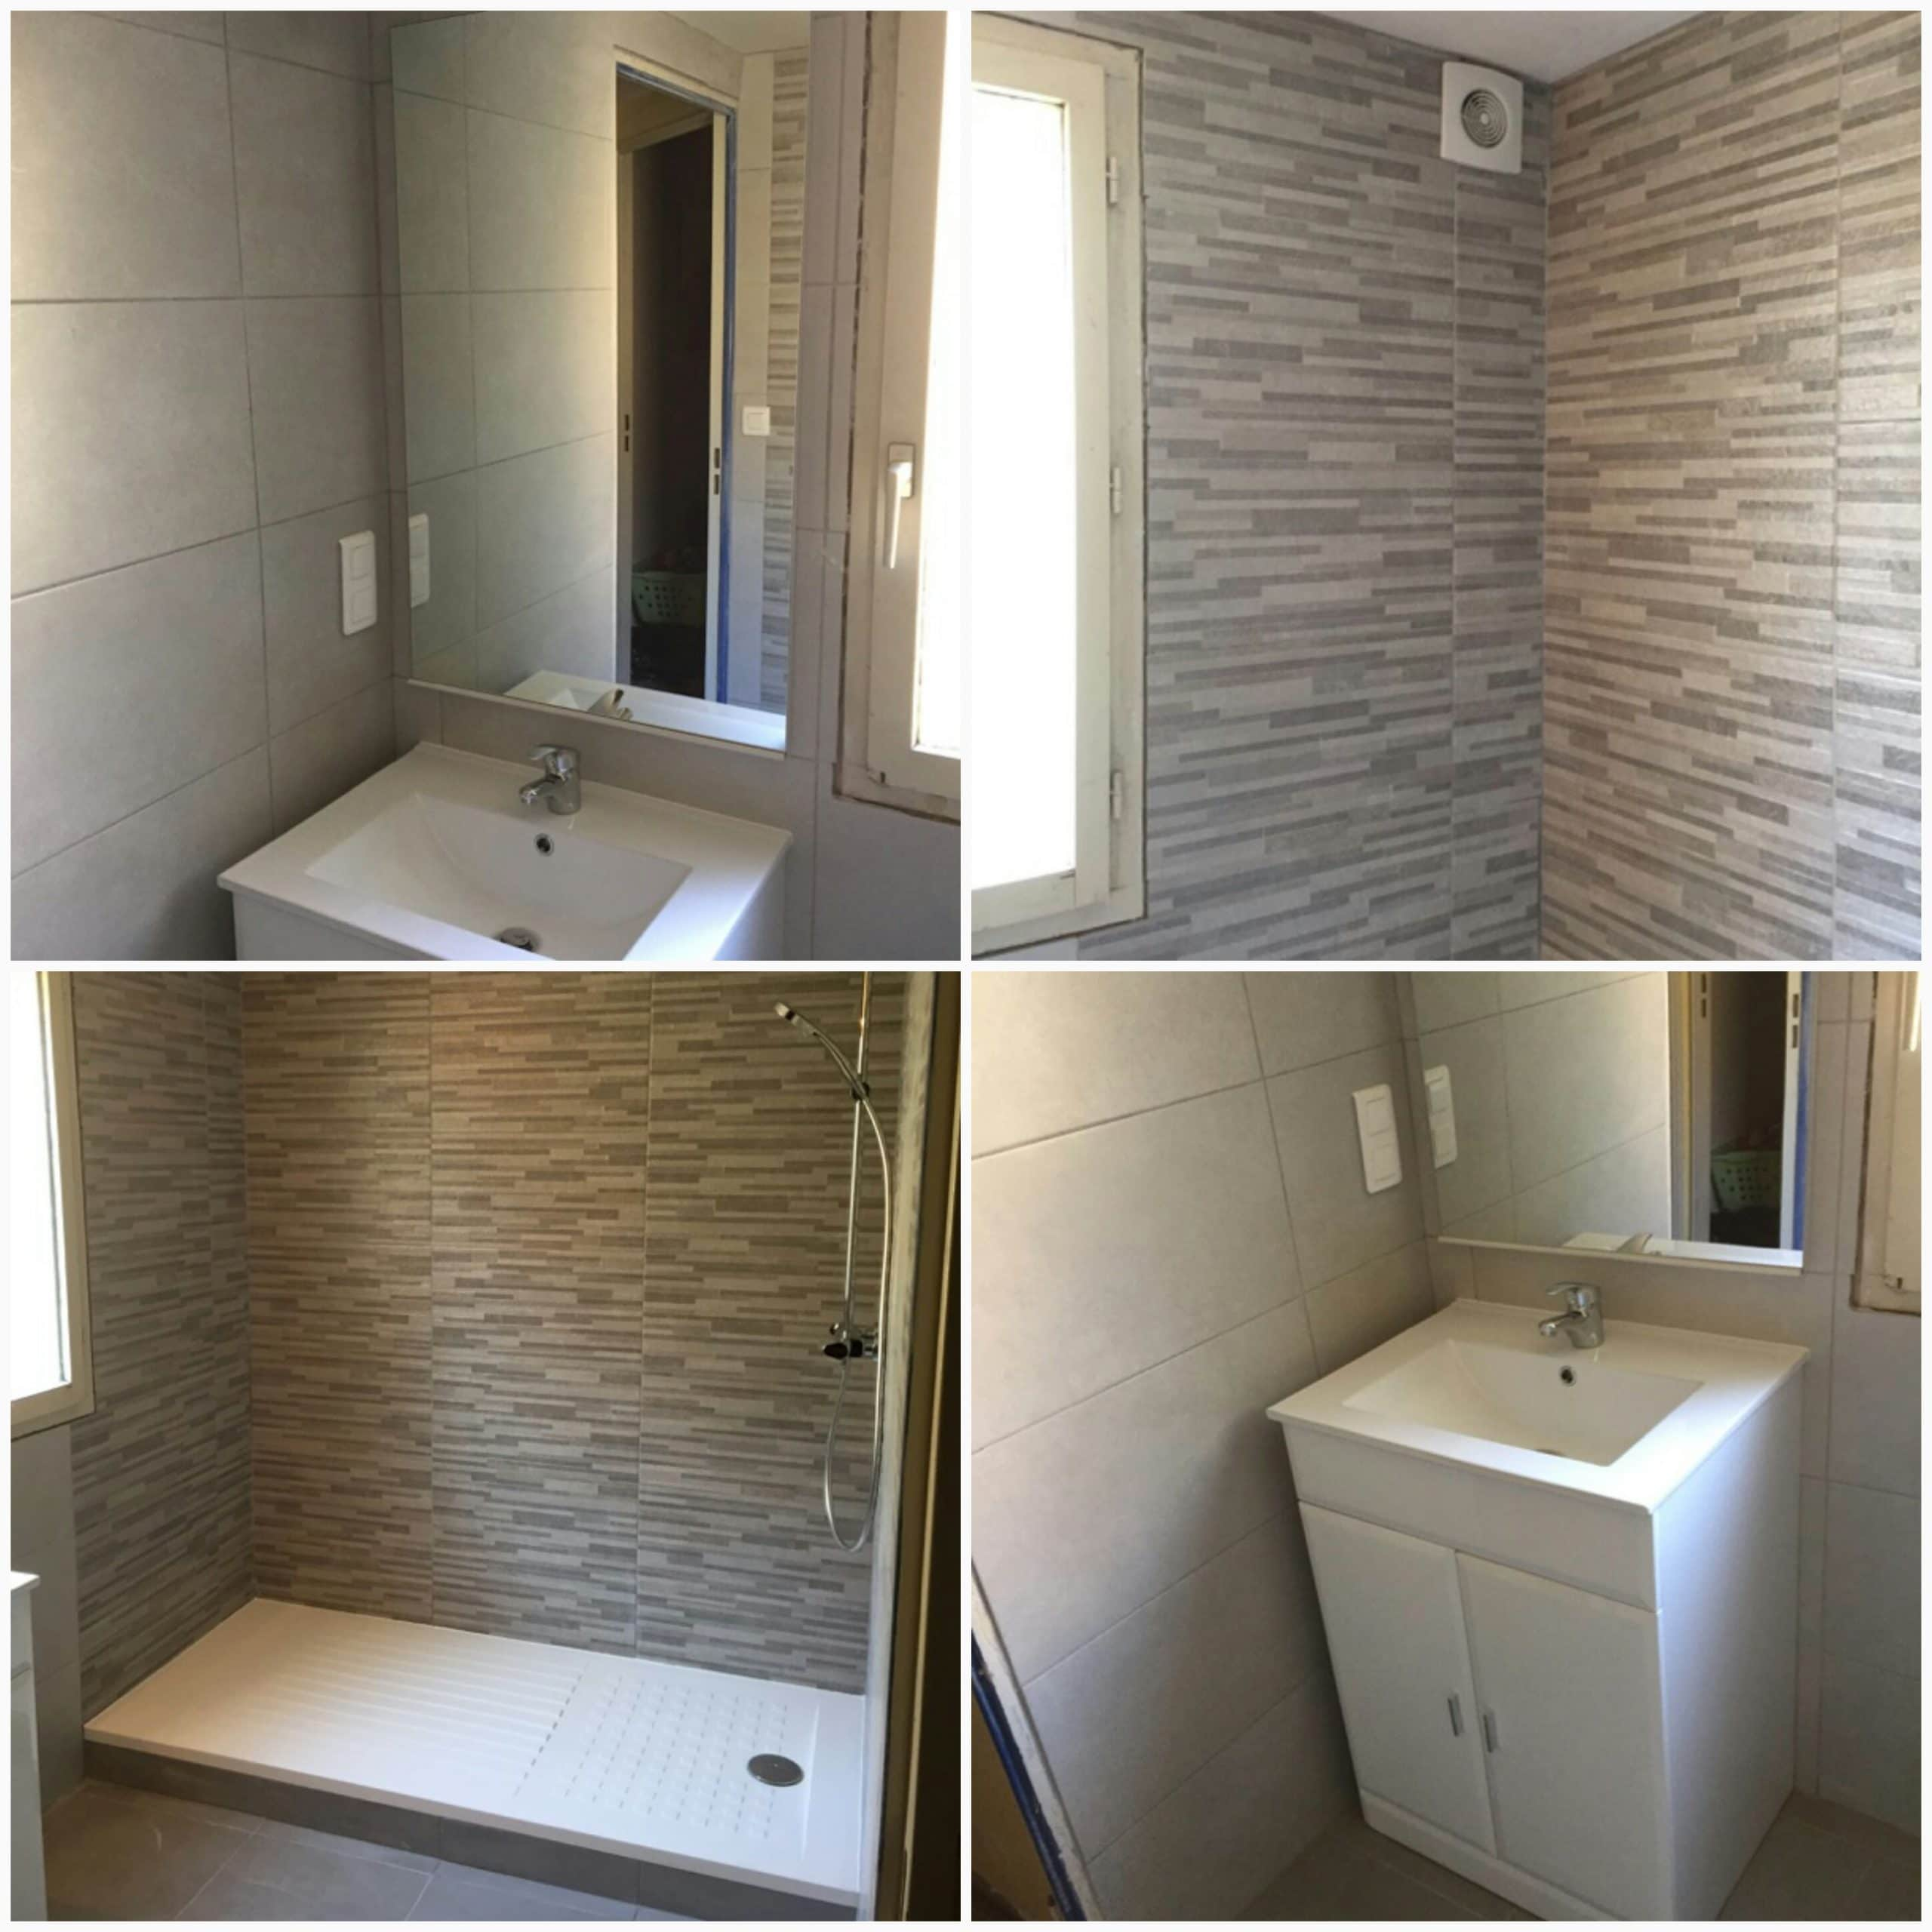 salle de bain design avec mur en pierre